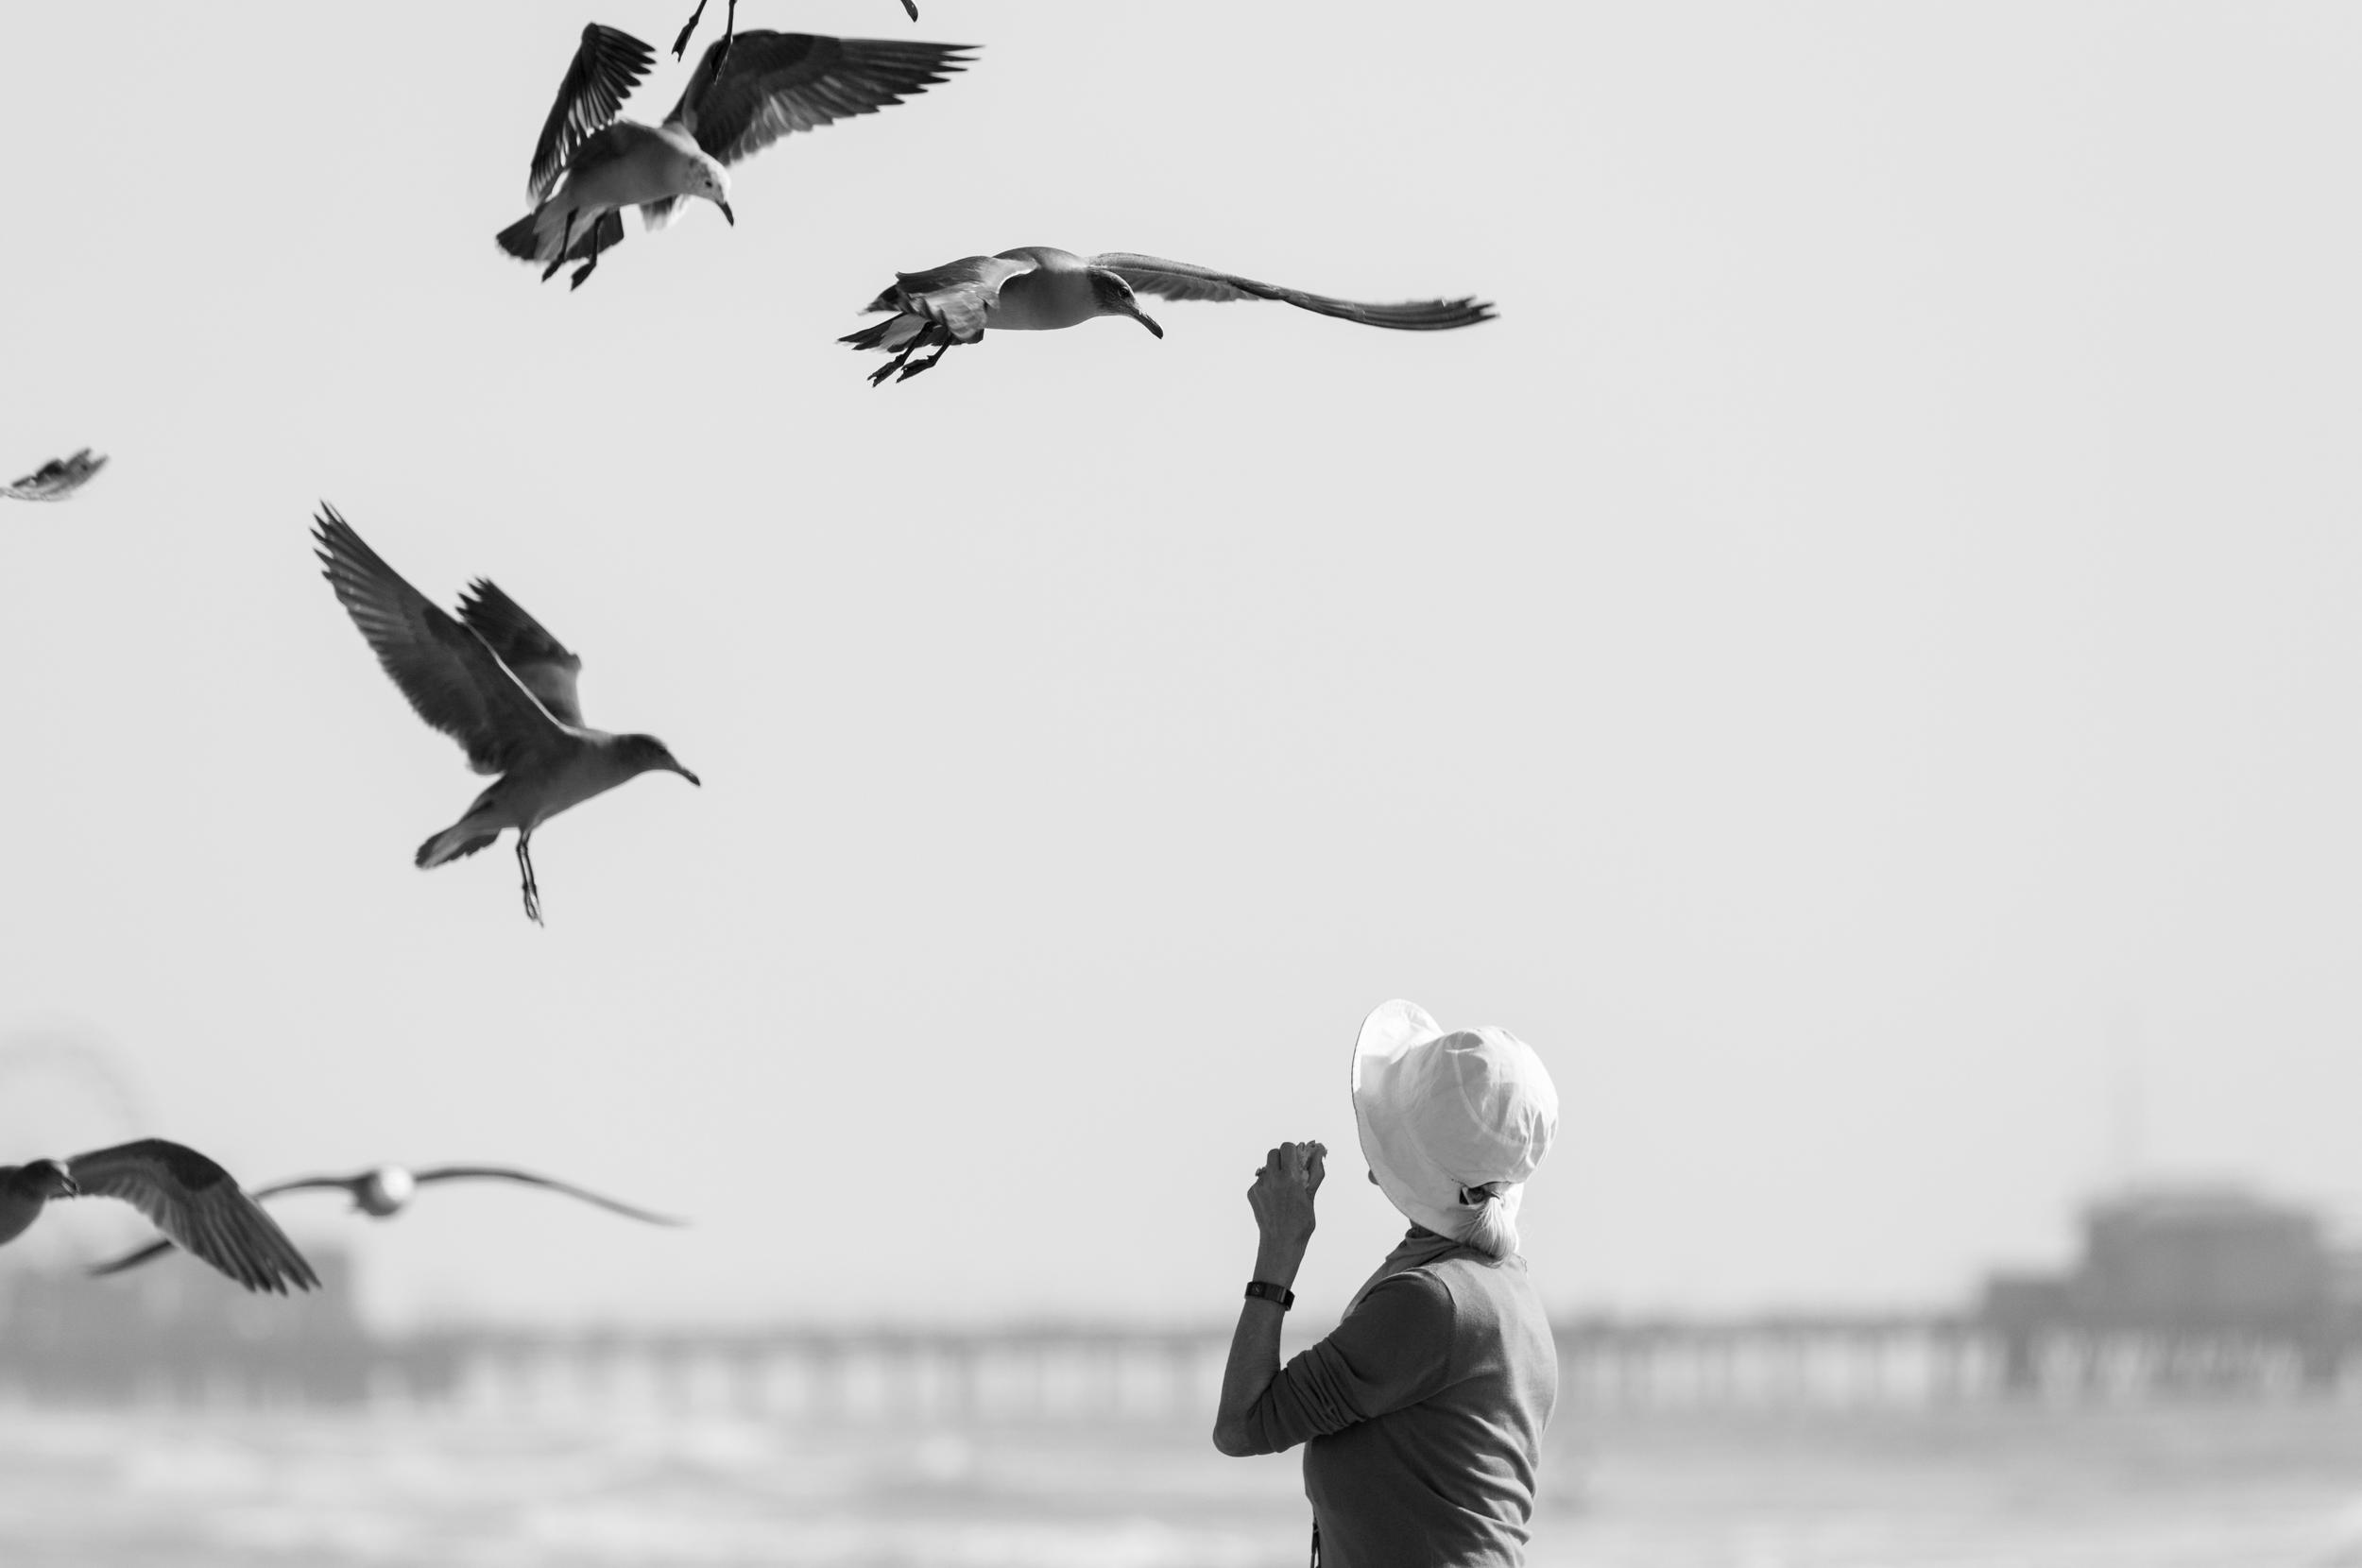 Feeding the seagulls on Santa Monica beach